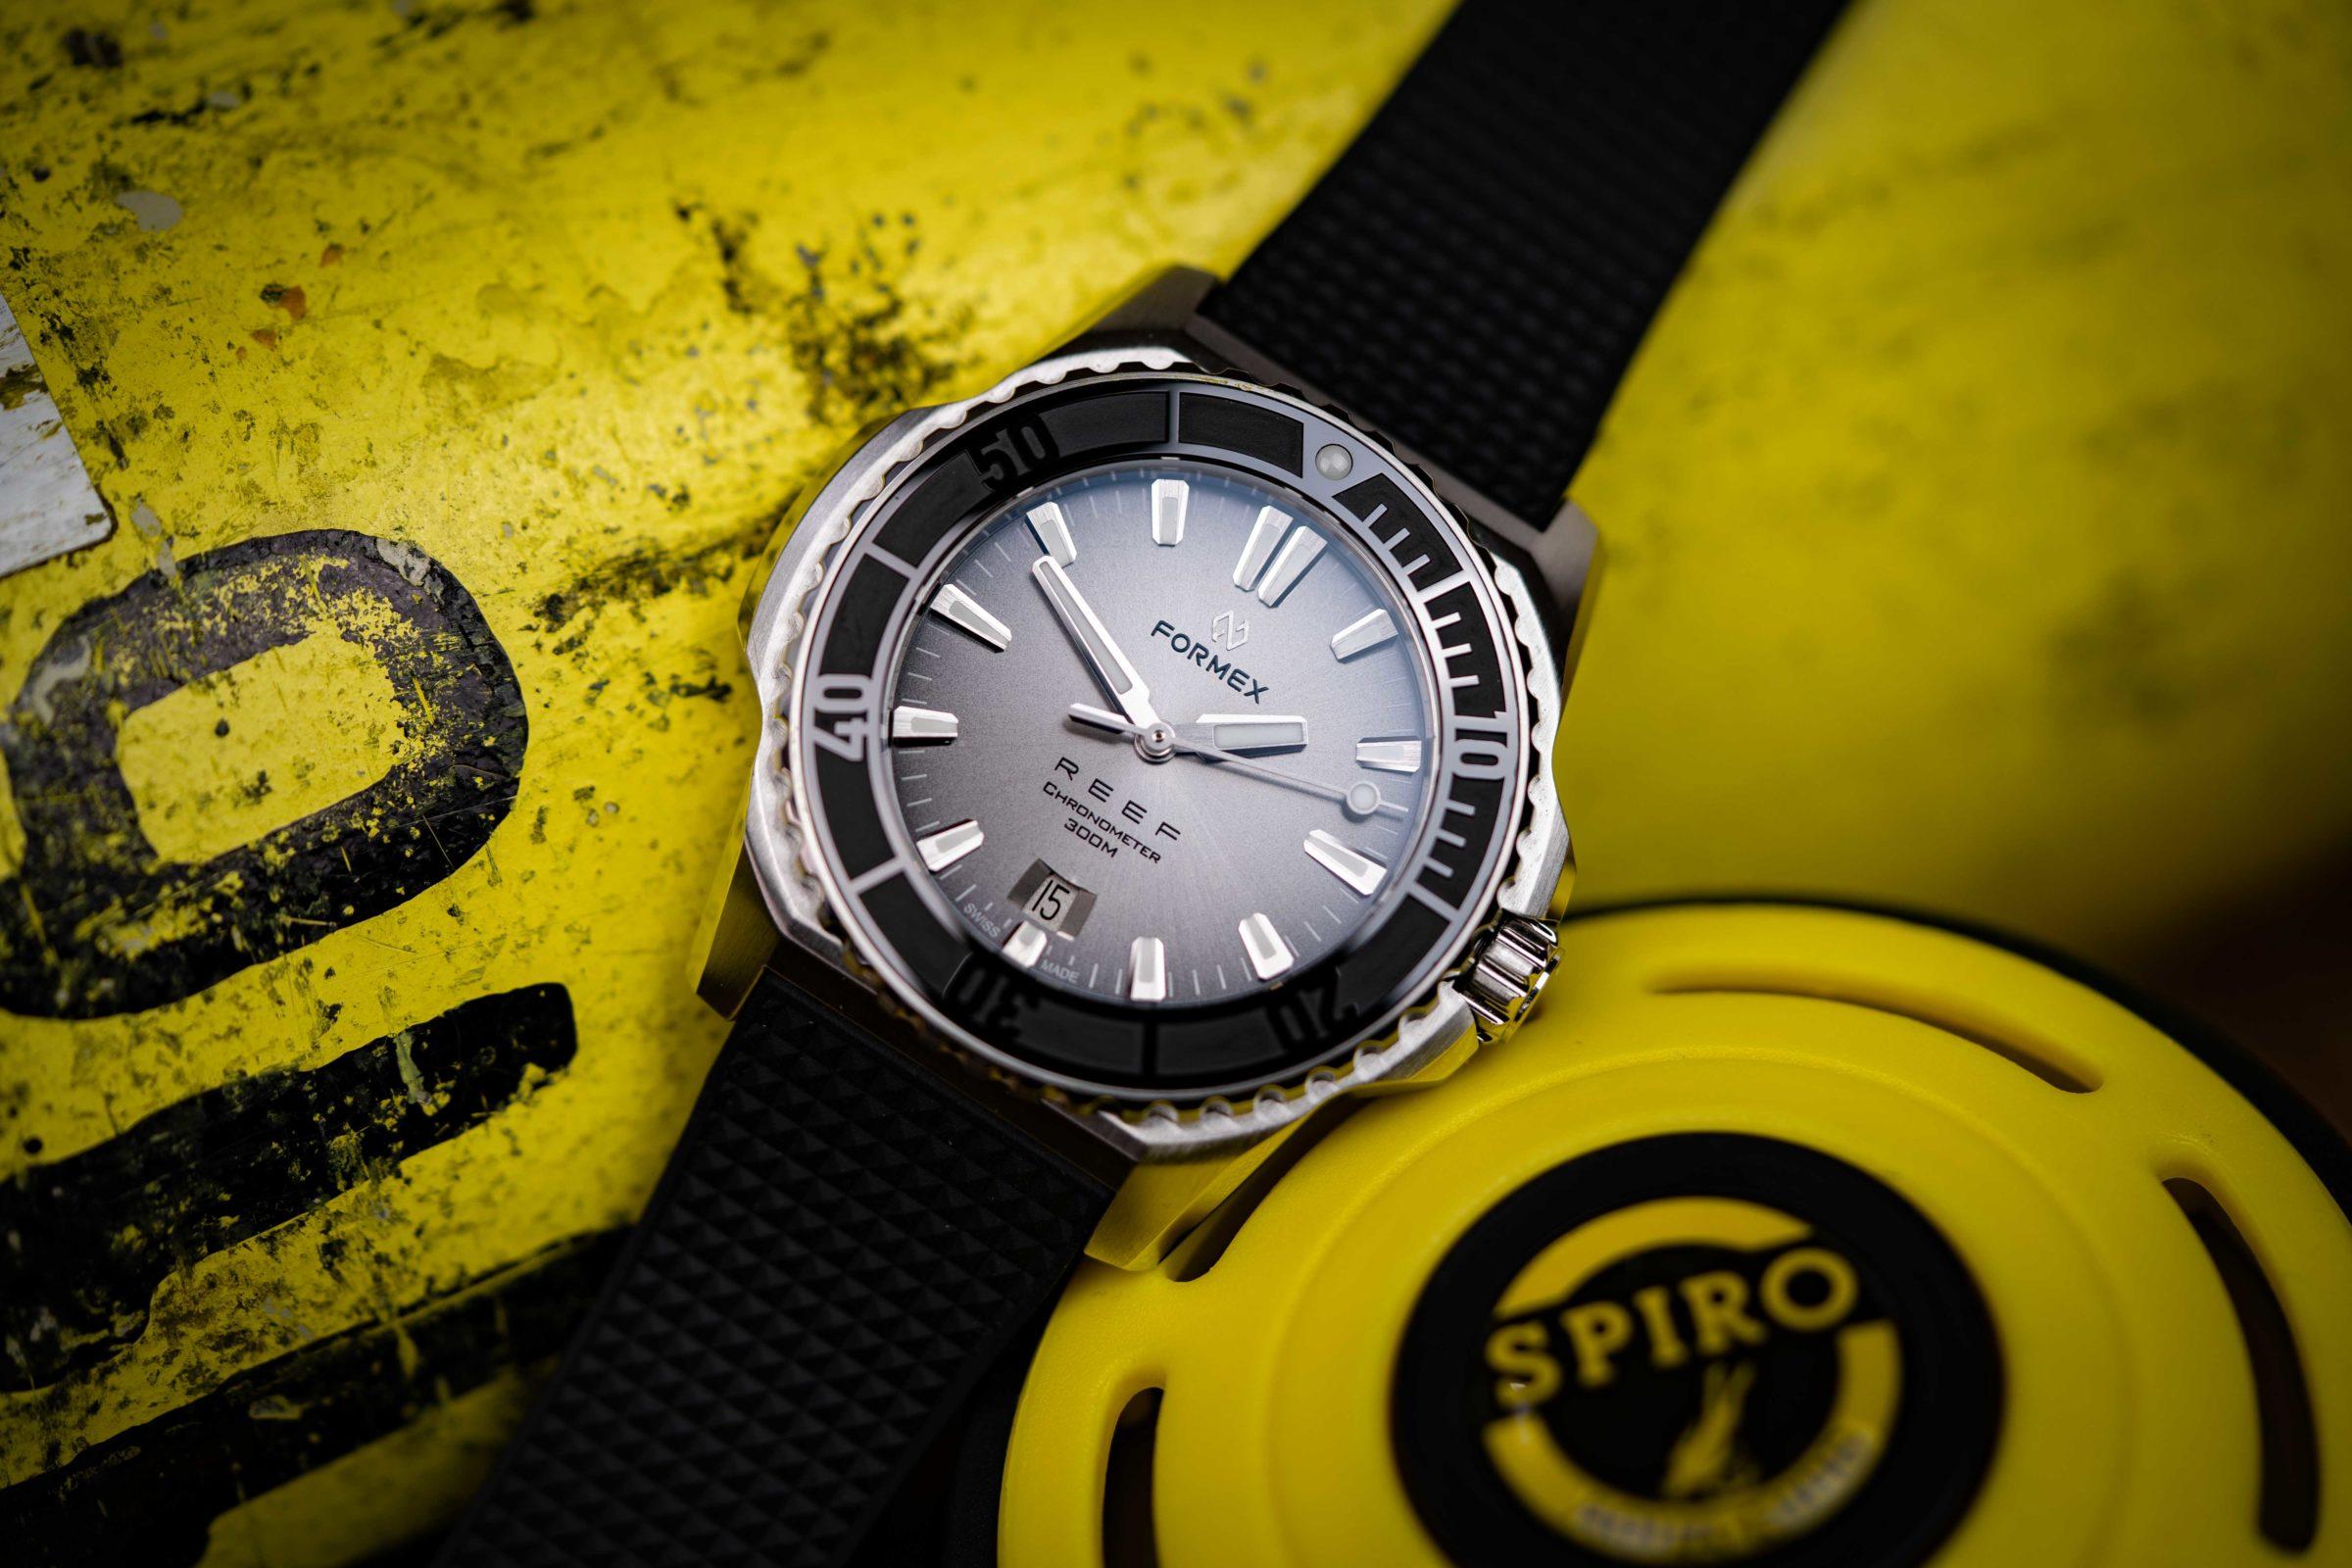 Formex-Reef-Automatik-Chronometer-300m-Taucheruhr-Test